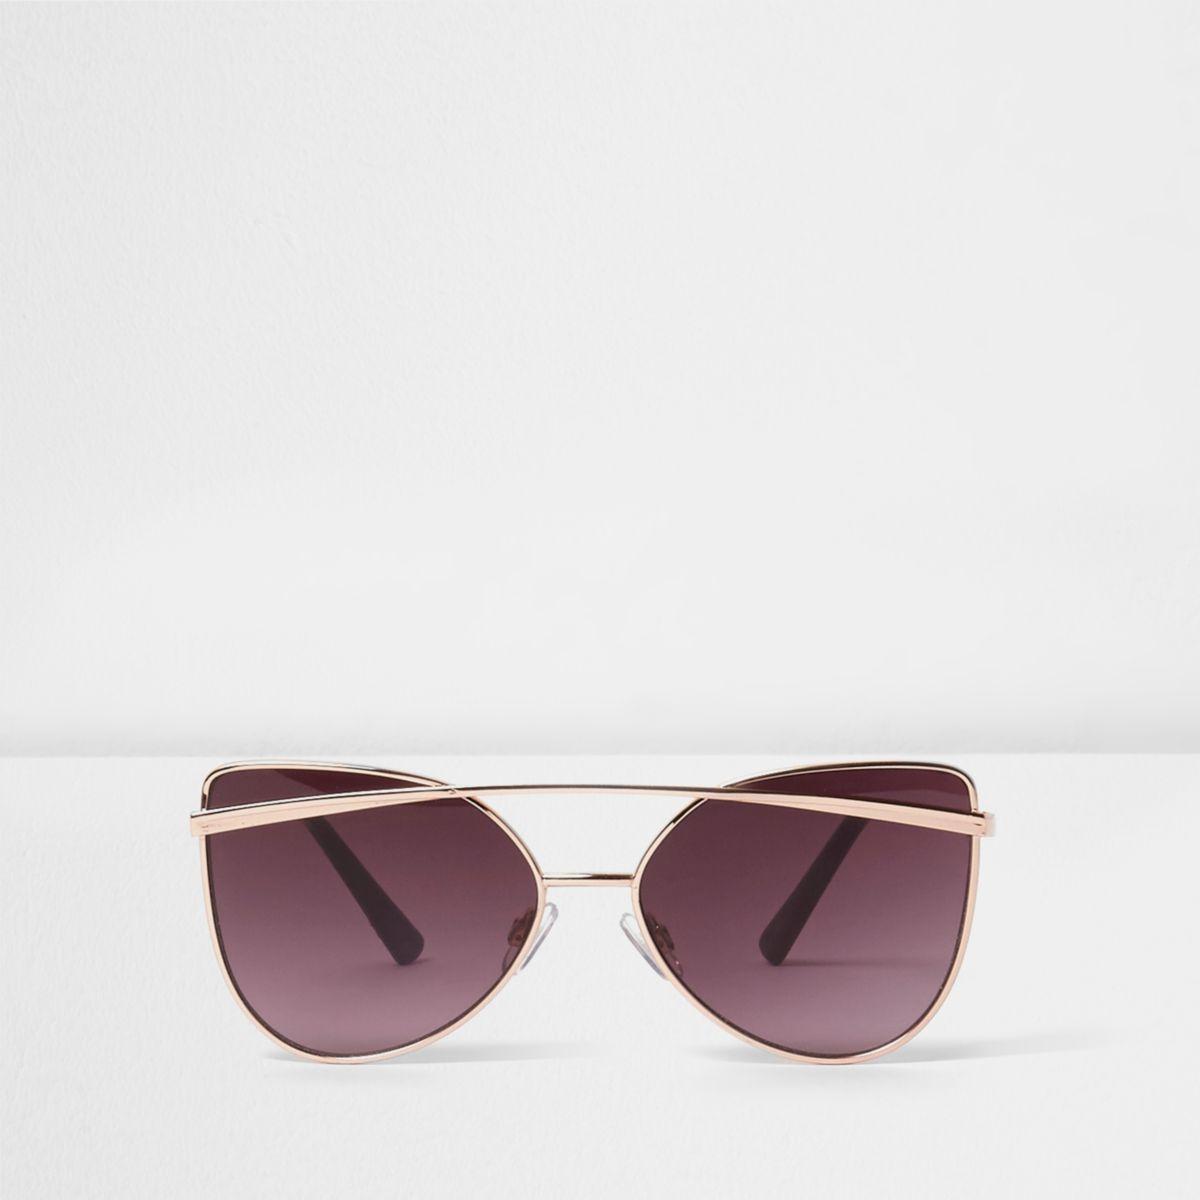 Girls rose gold tone brow bar sunglasses